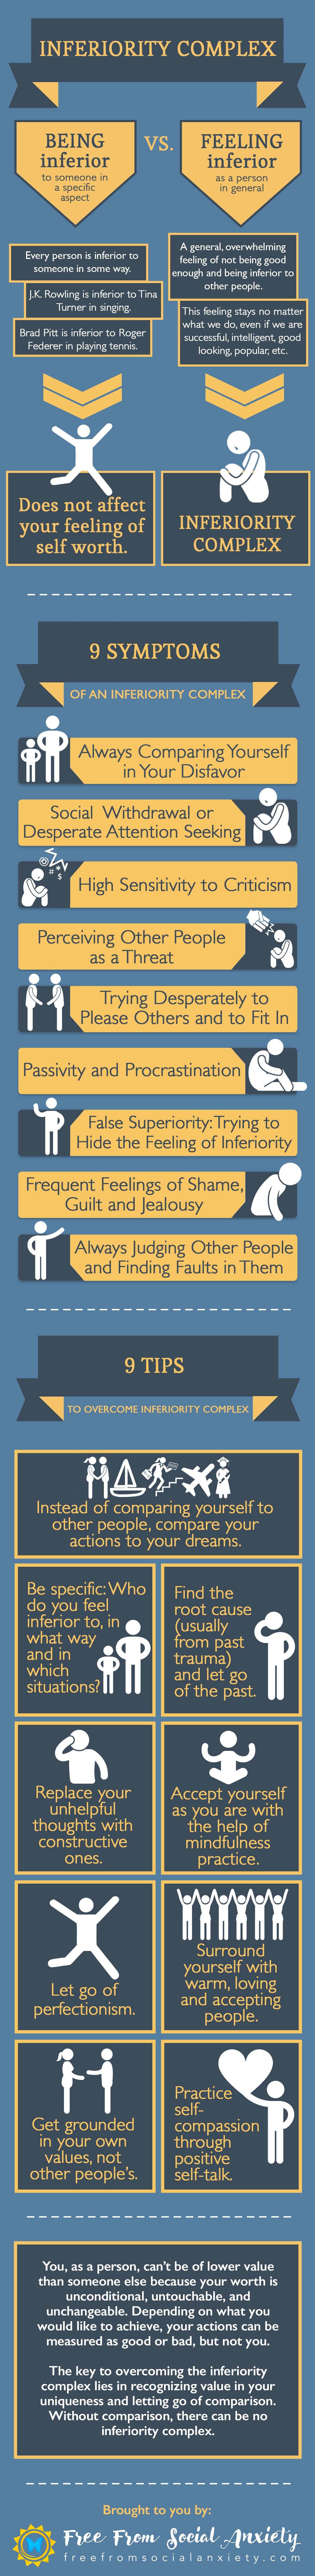 inferiority complex infographic